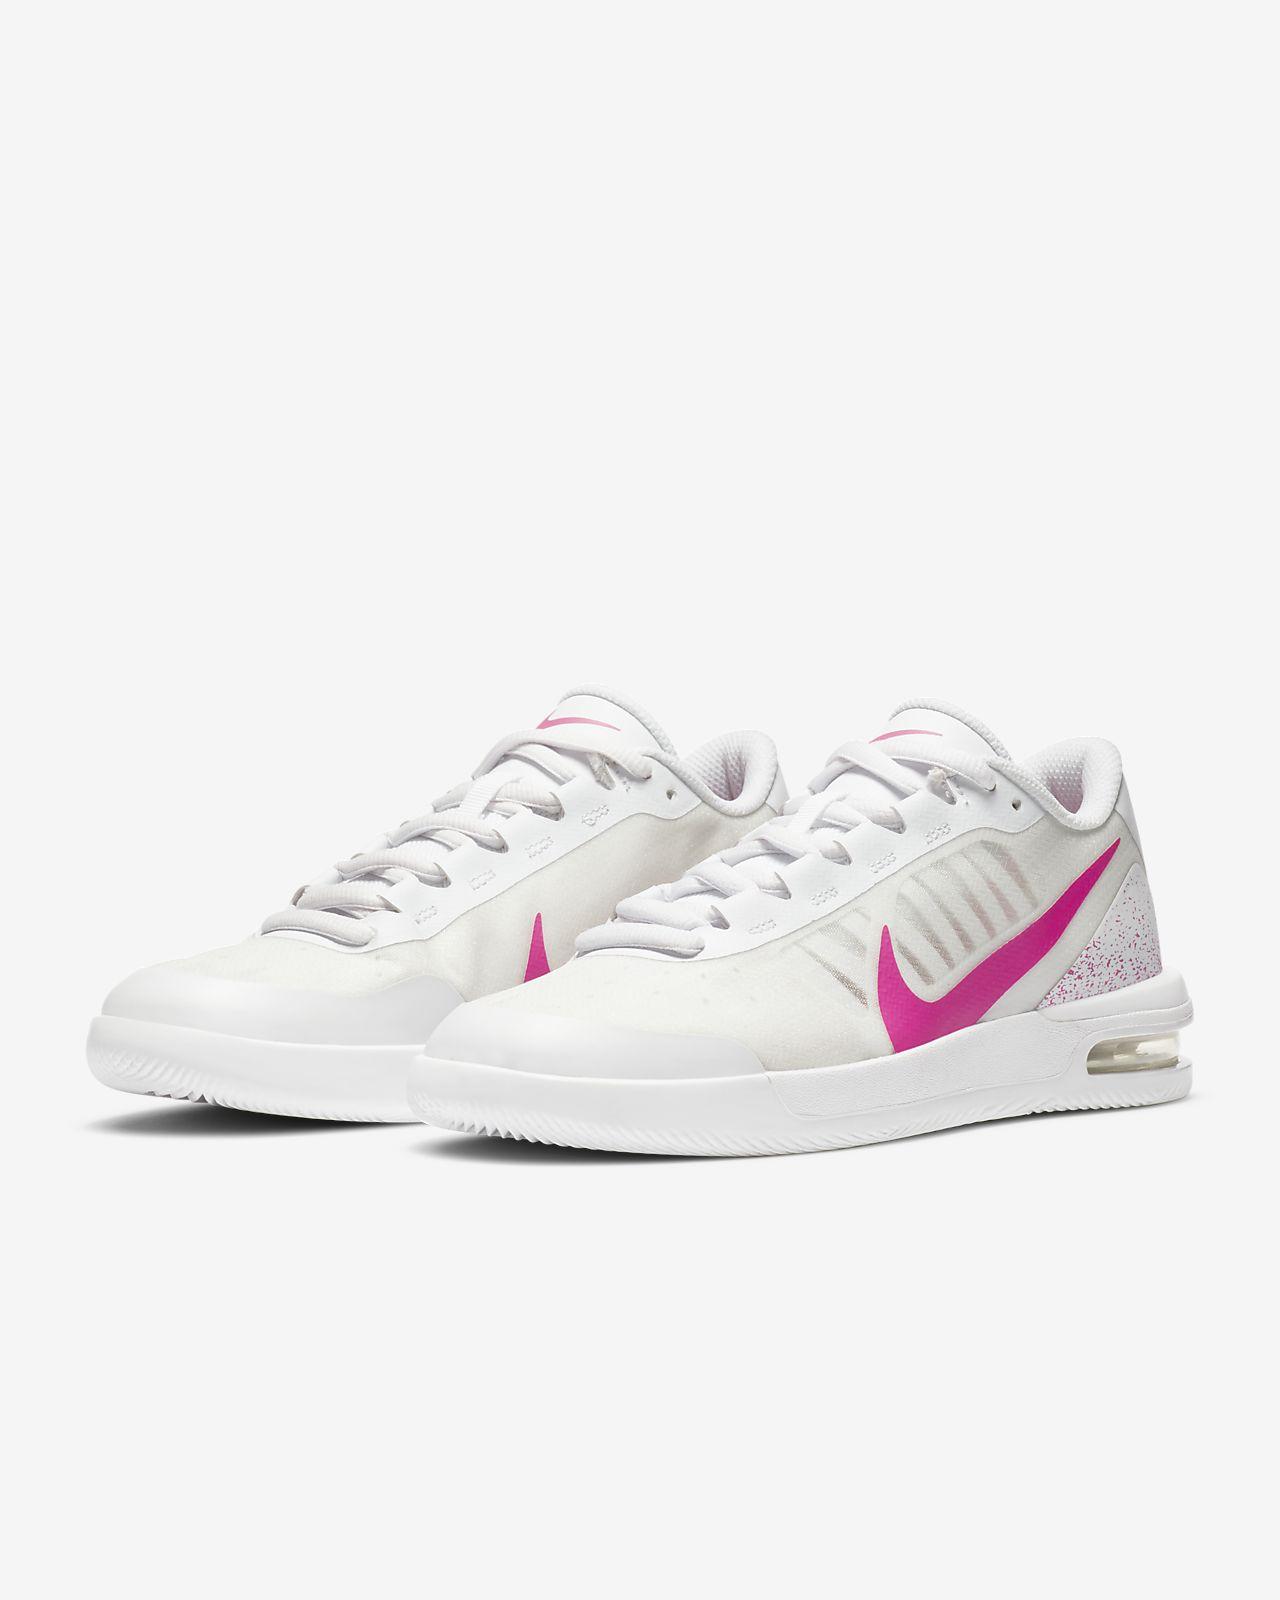 NikeCourt Air Max Vapor Wing MS tennissko til kvinder